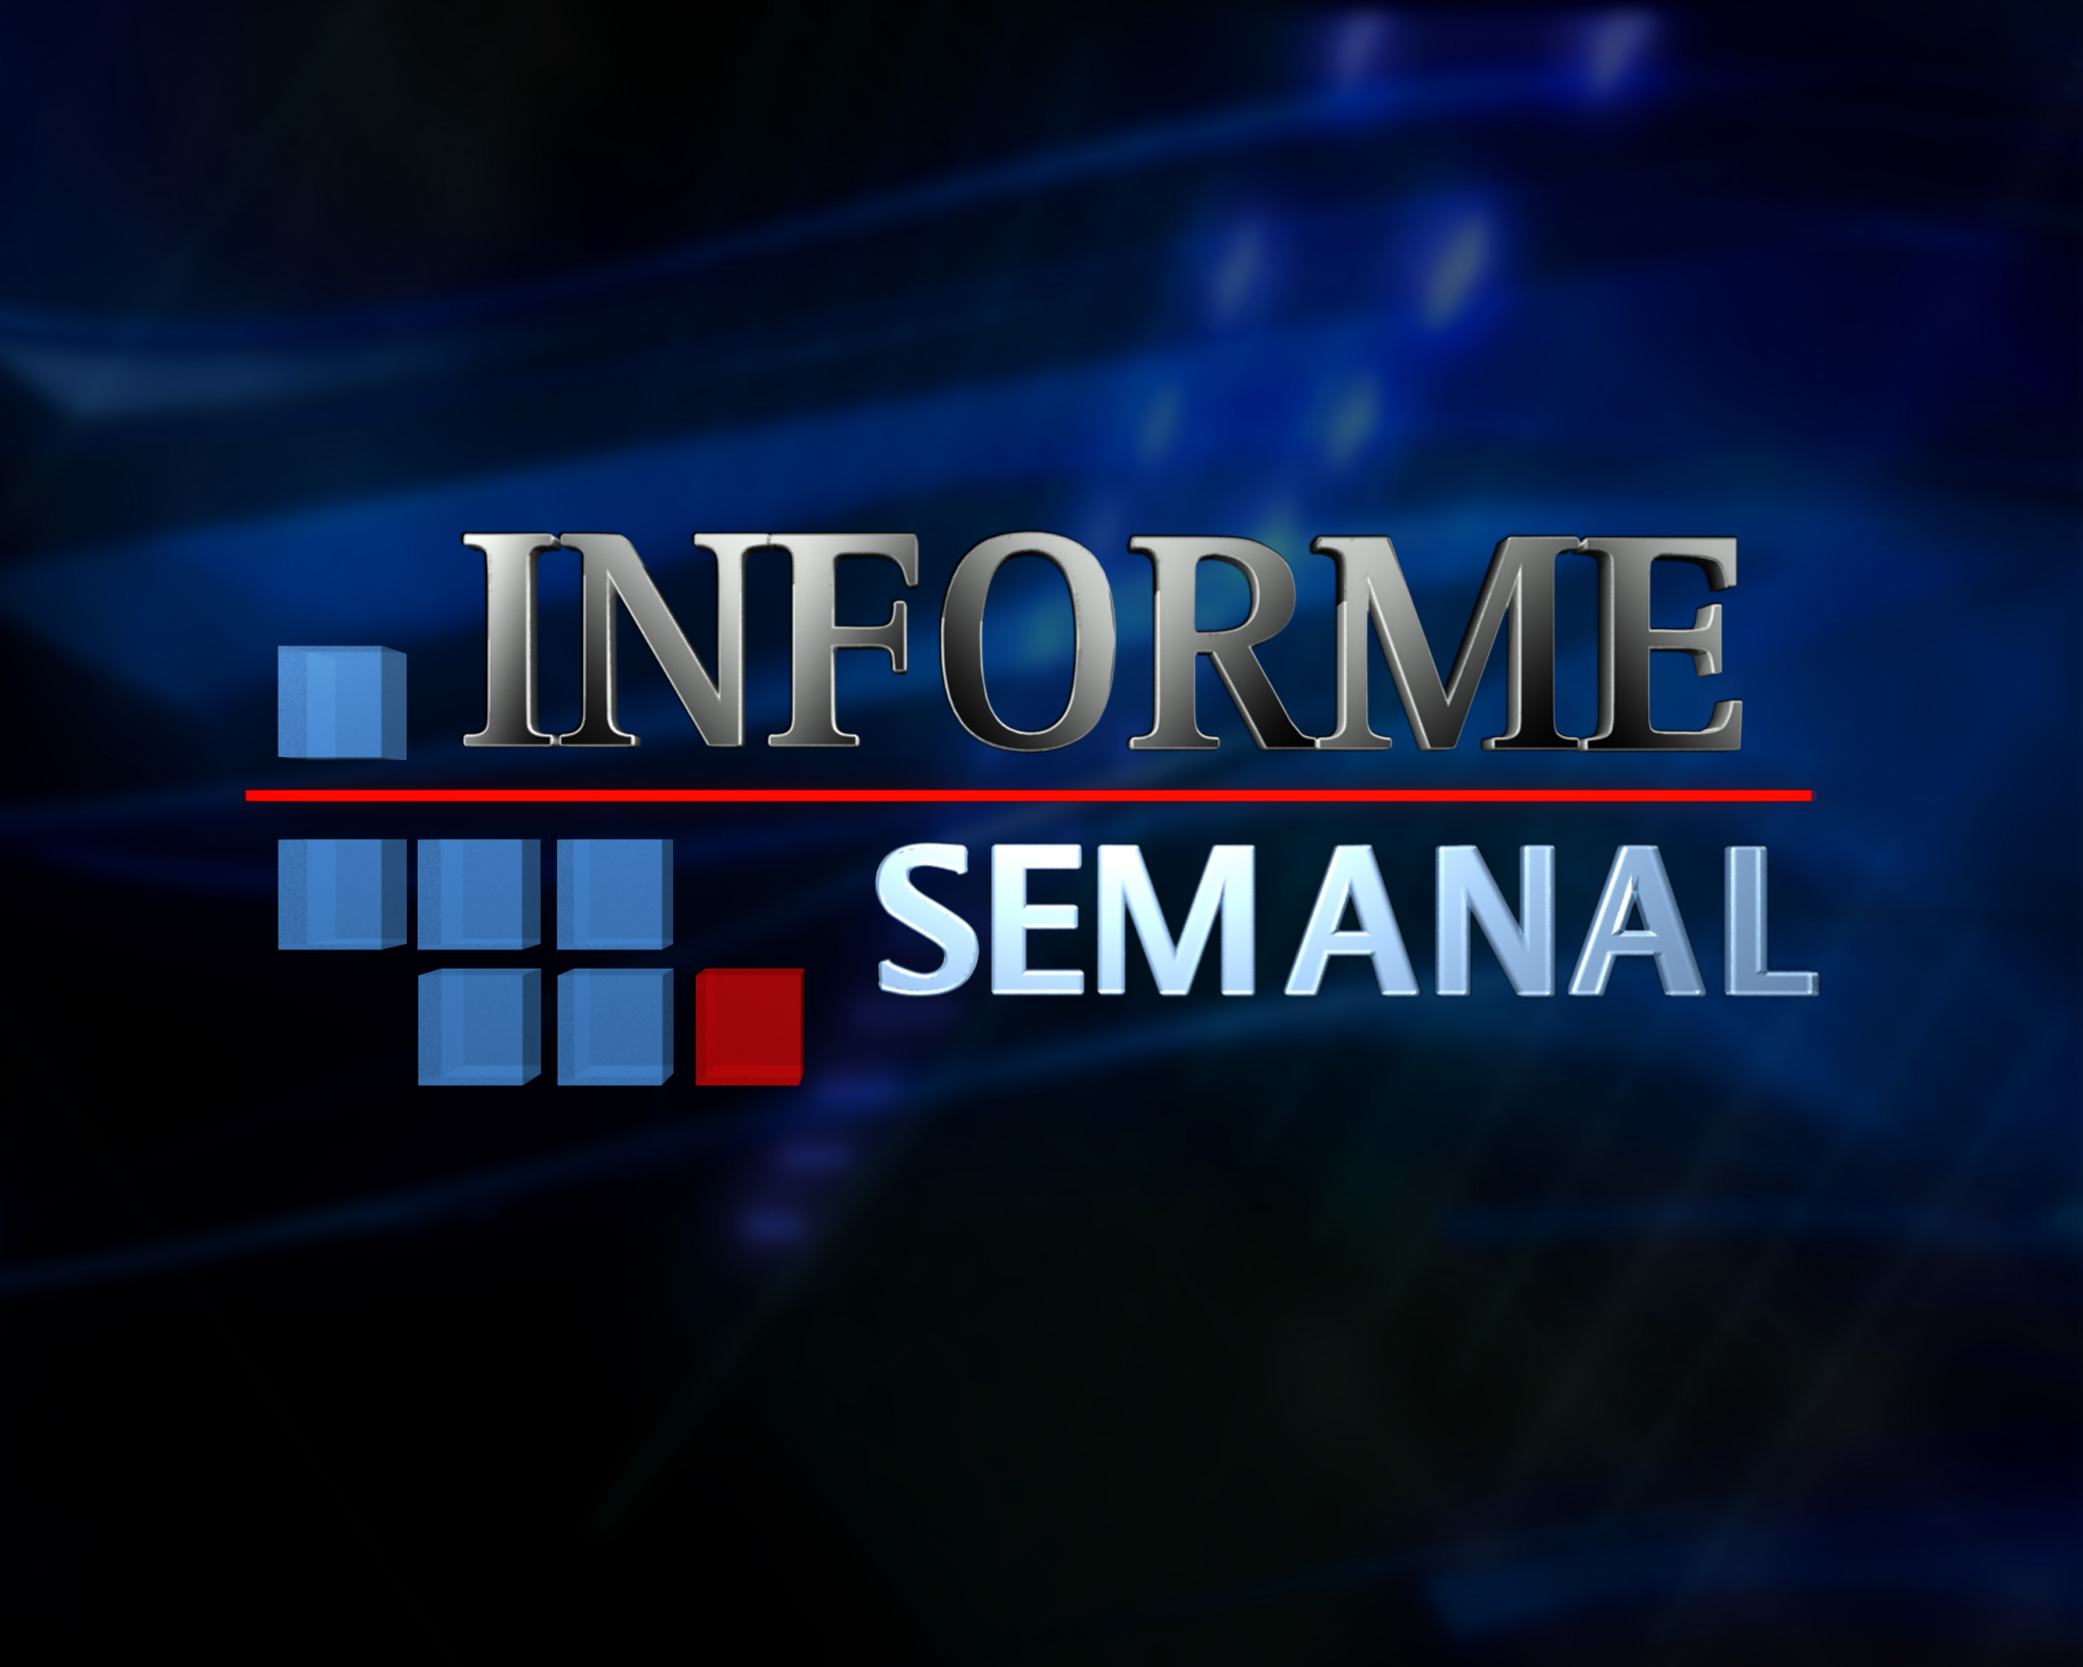 Informe Semanal Logo